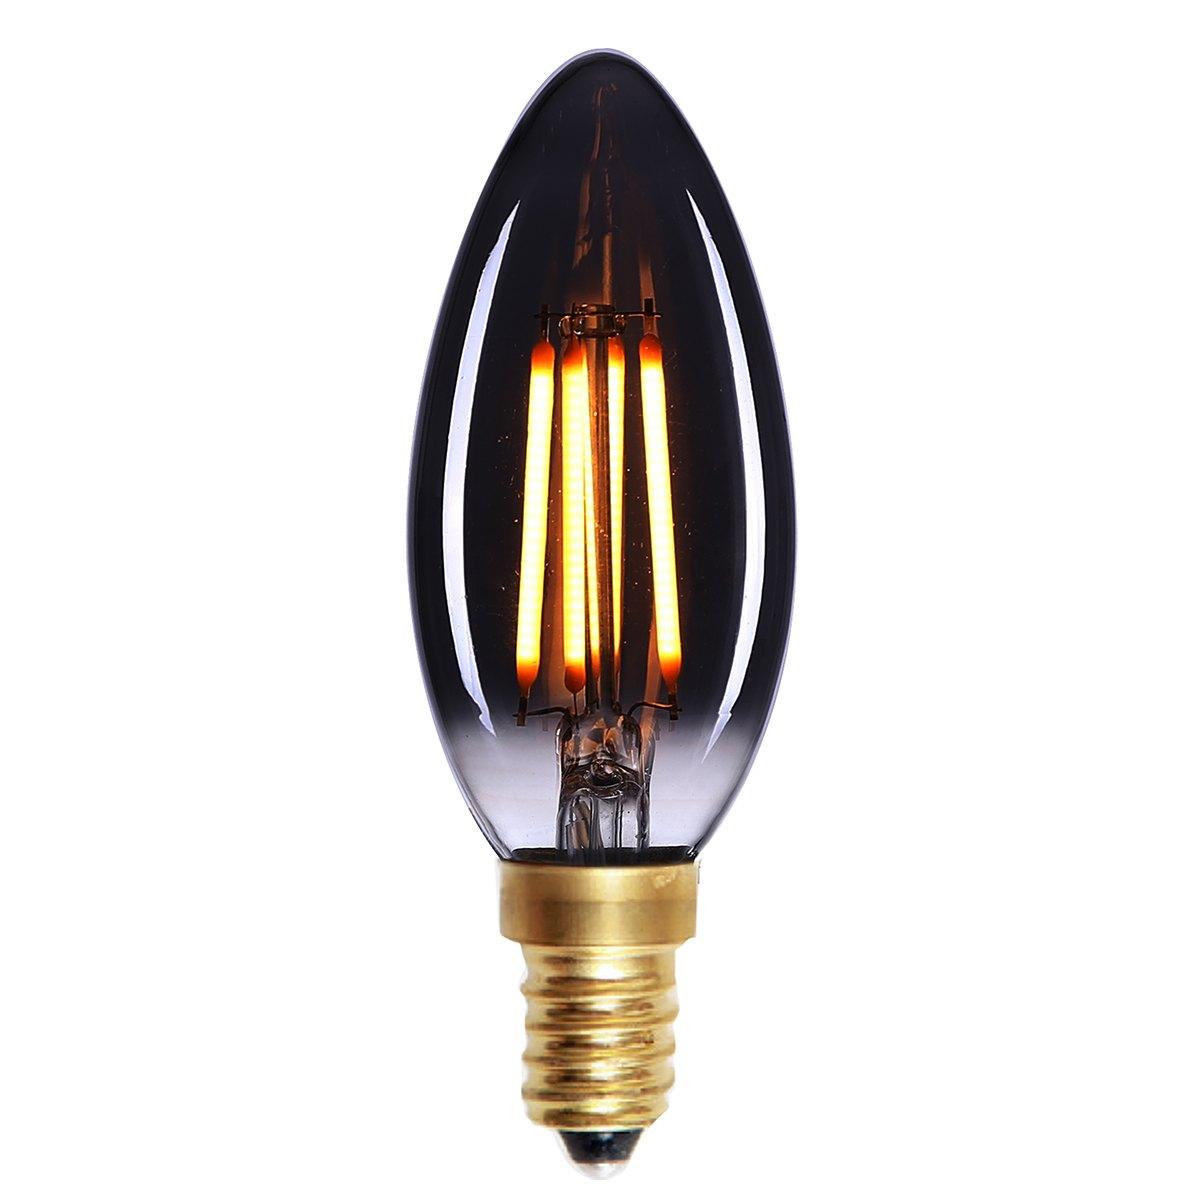 Kaarslamp LED Filament 4W Smoke dimbaar E14